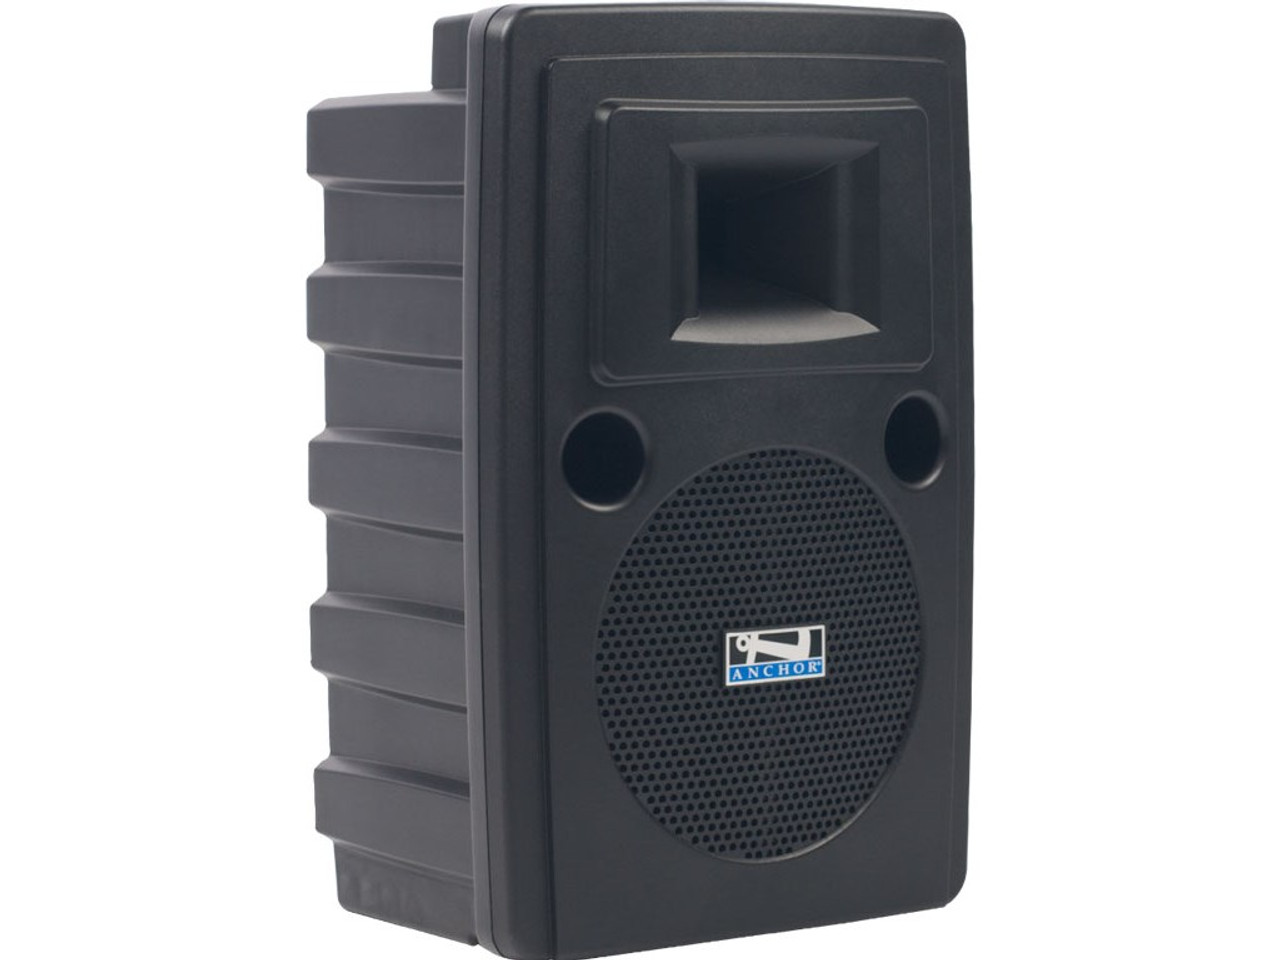 Anchor Audio LIB2-COMP with built-in Bluetooth (LIB2-COMP)